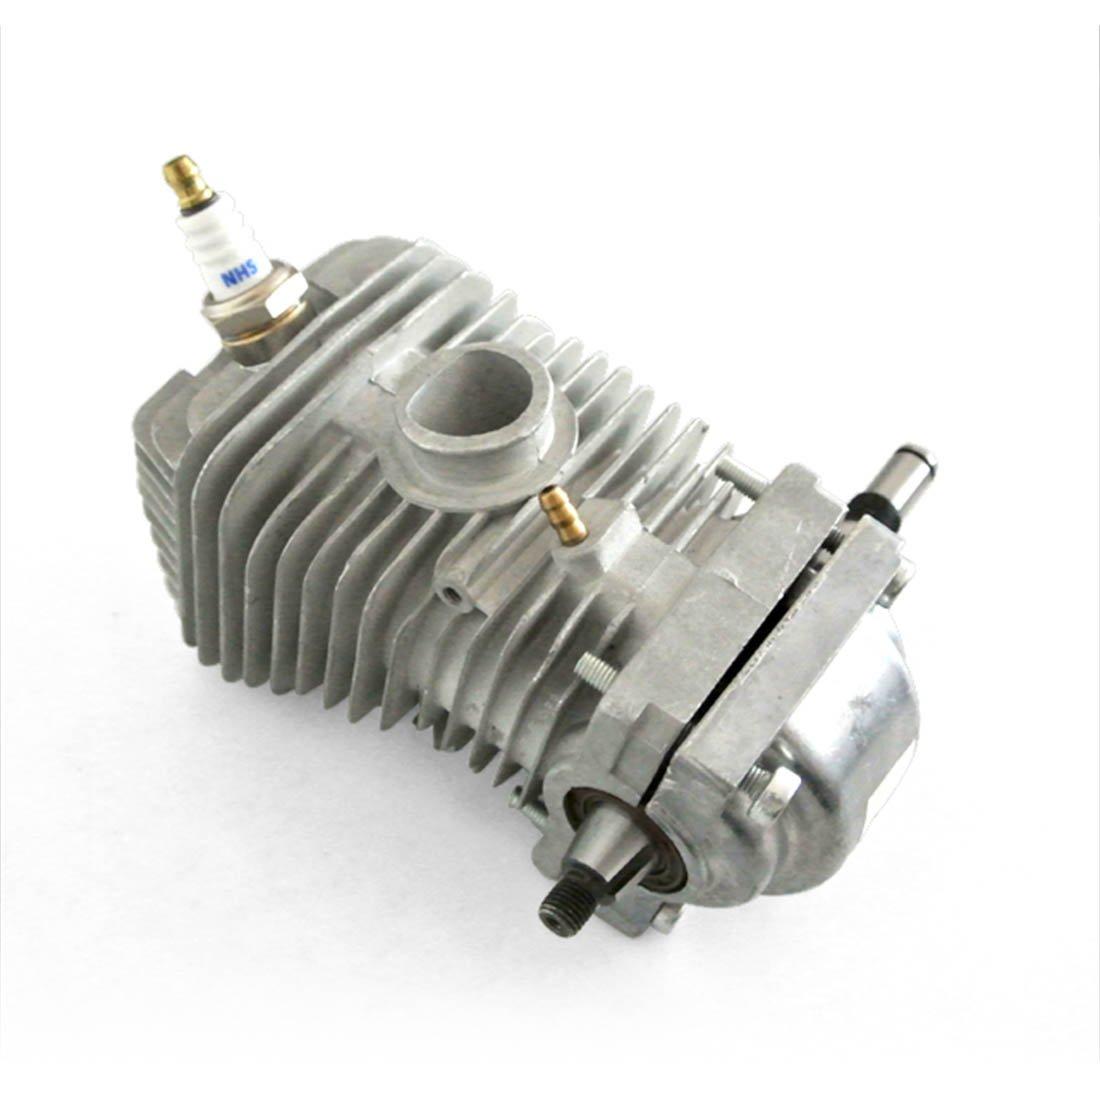 New Complete Built Engine for STIHL 023 025 MS230 MS250 Chainsaw&Crankshaft JL JIANGLI LEGEND